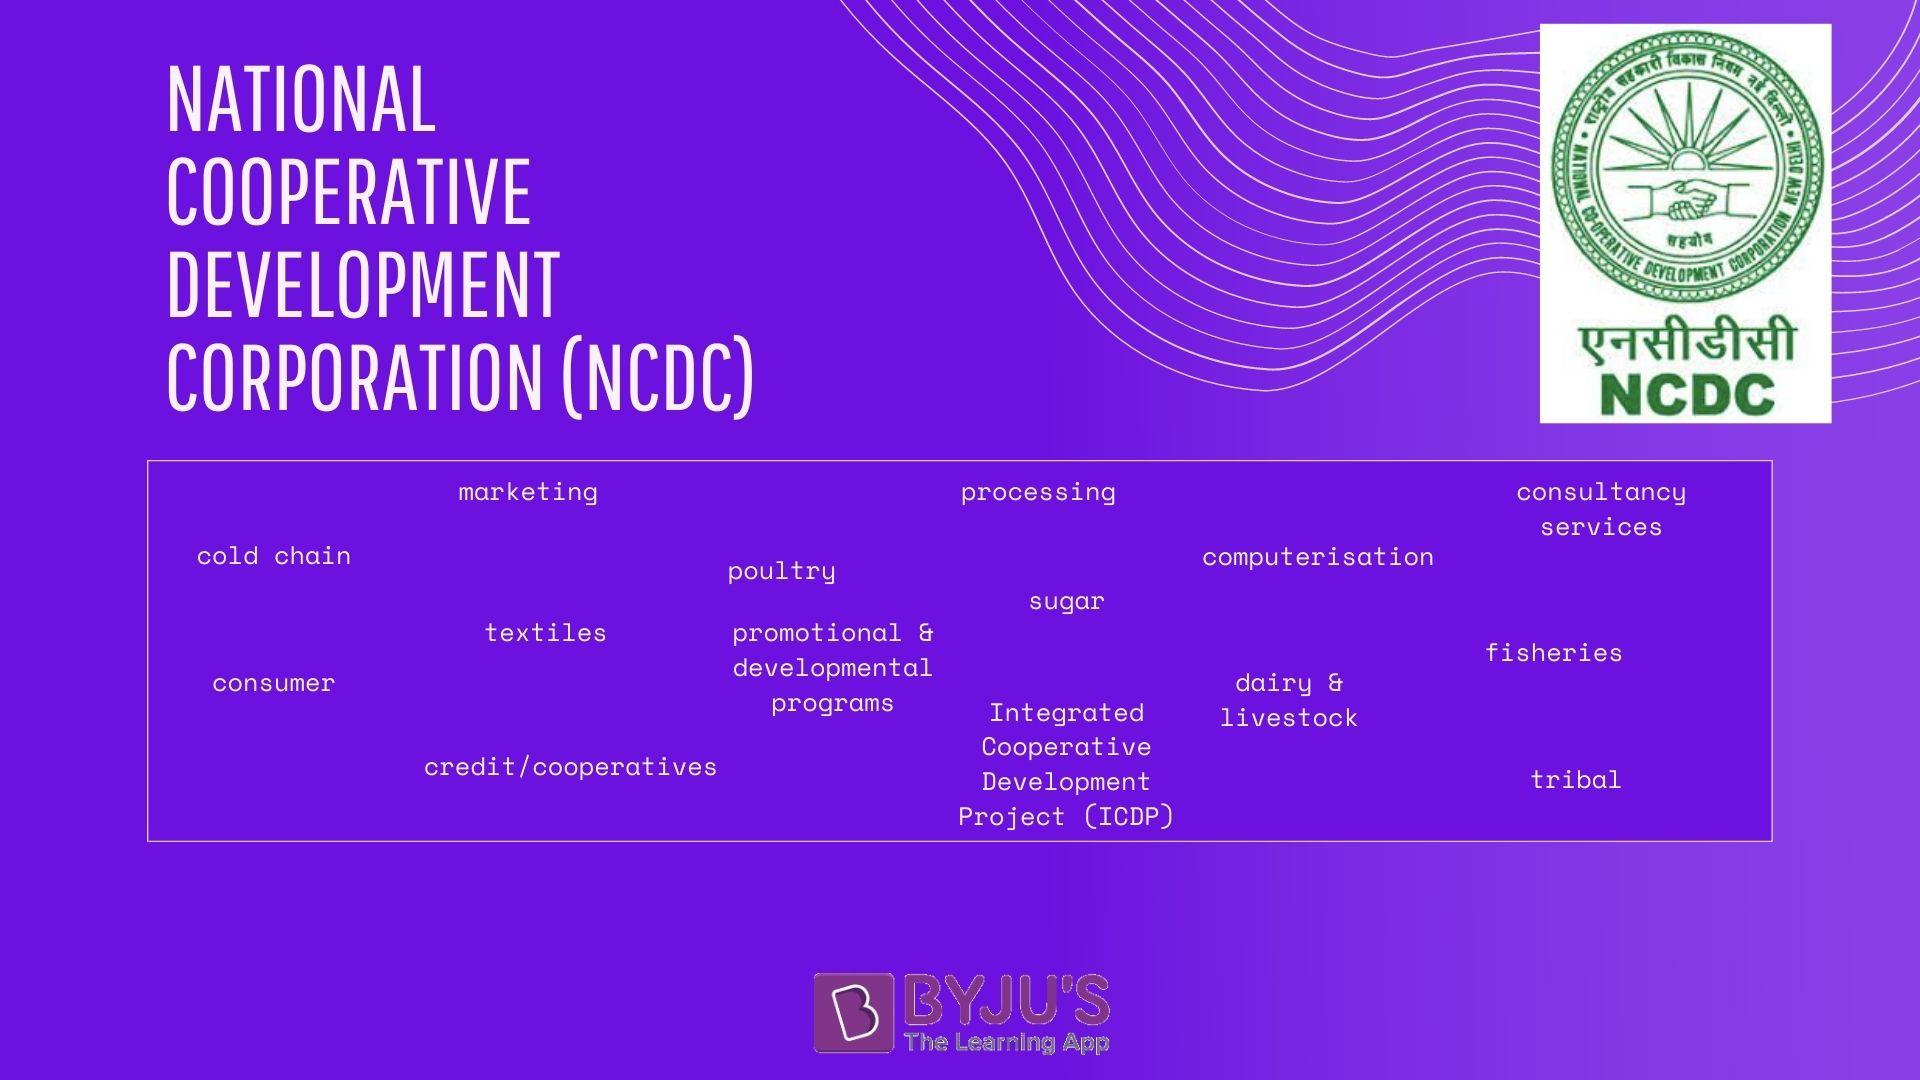 NCDC Activities